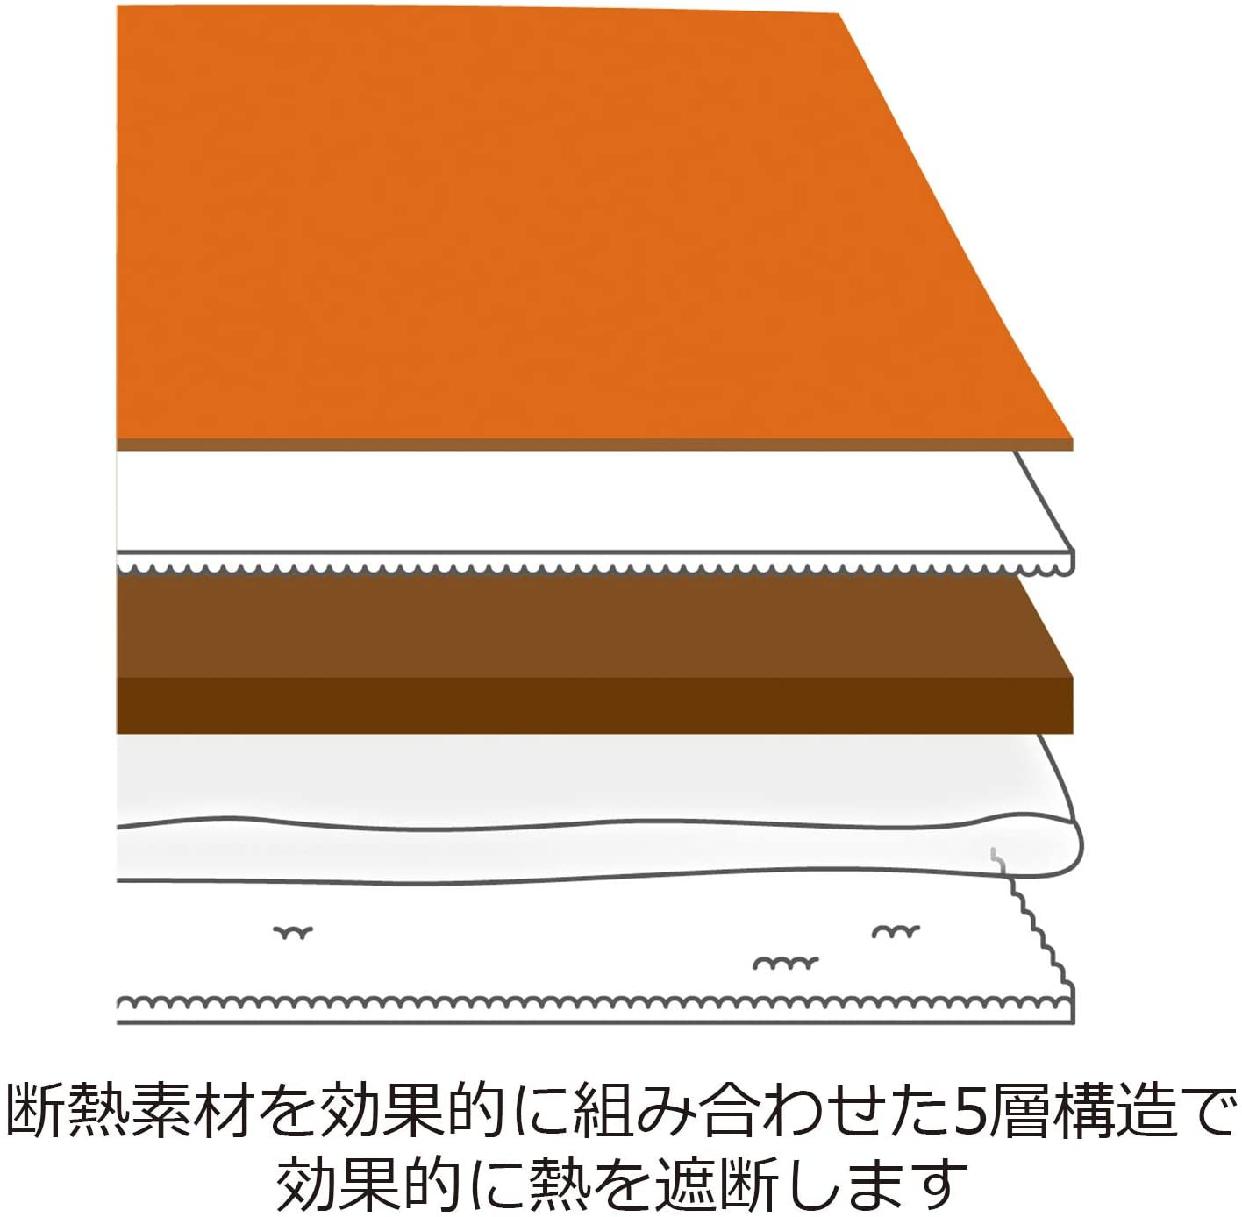 LEYE(レイエ) グッとつかめる耐熱ミトンの商品画像6